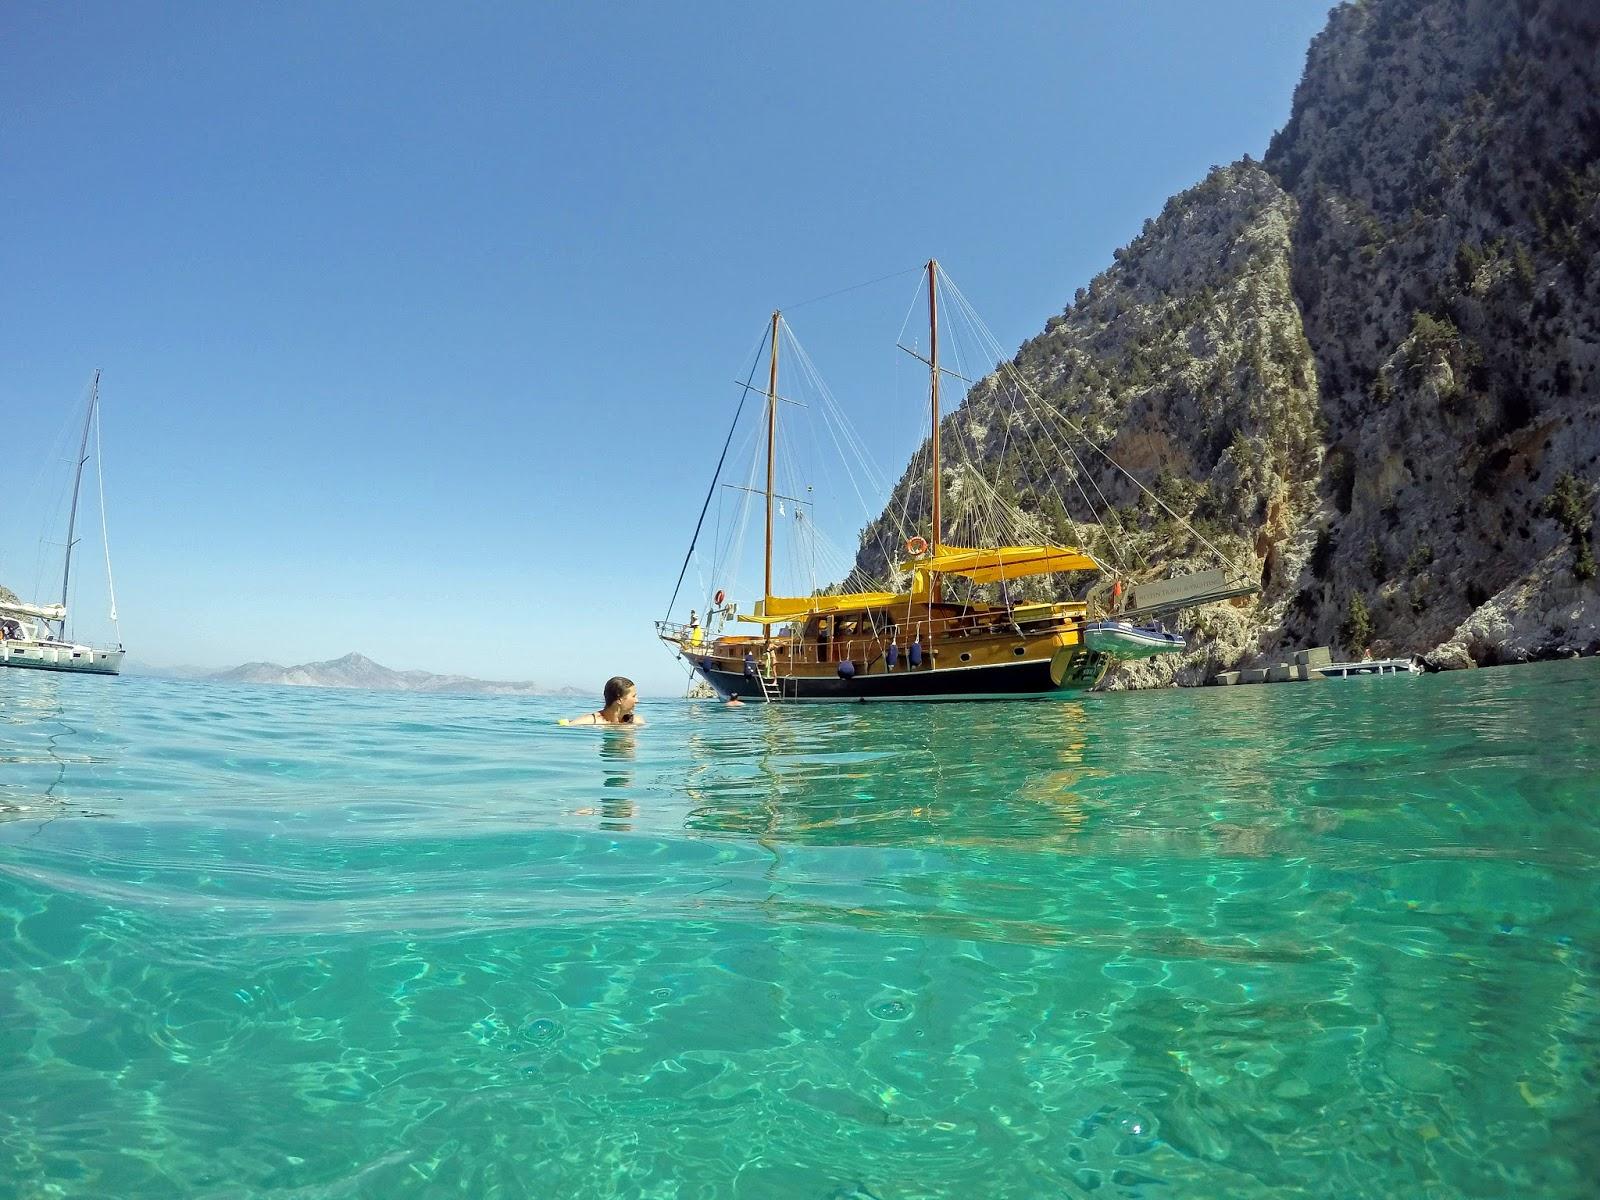 Beautiful Water Sailing in Turkey